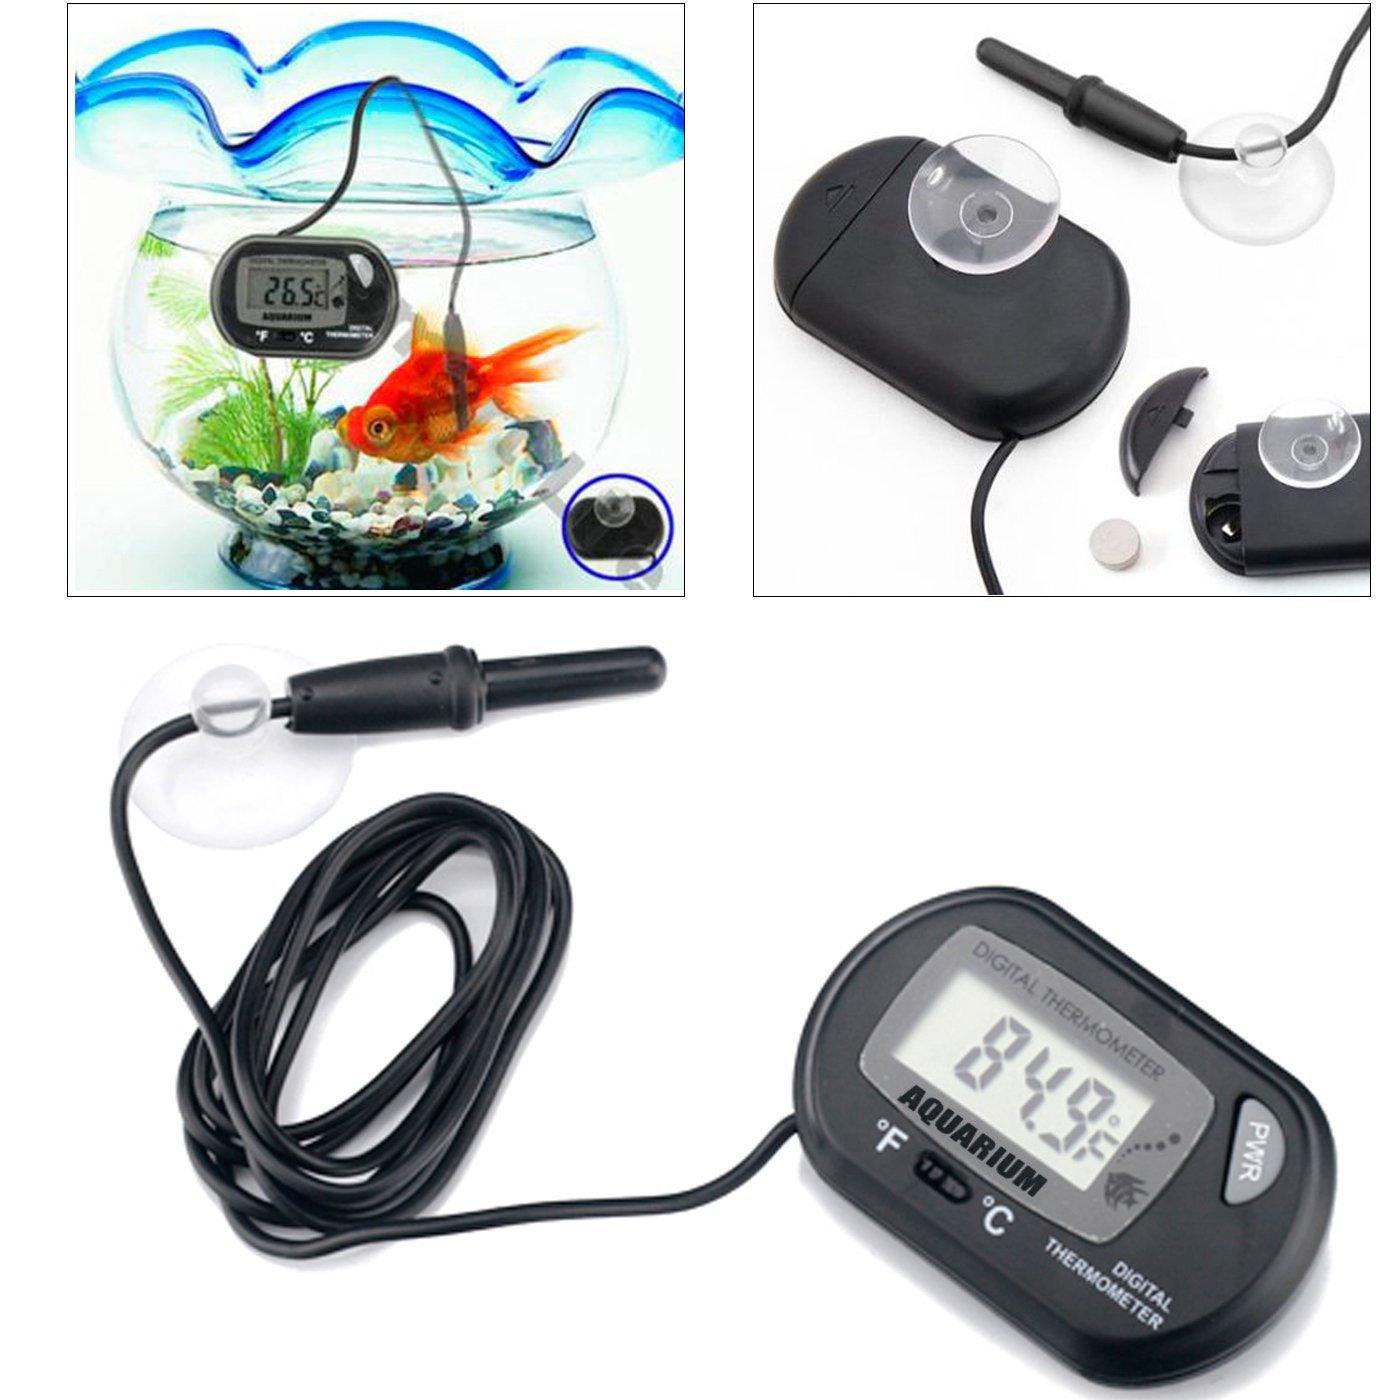 Professional Digital Thermometer for Hydroponics & Aquaculture , Amphibian & Reptile Terrariums , Freshwater Tropical Fish & Saltwater Fish Aquariums , Black by AROCCOM (Image #5)